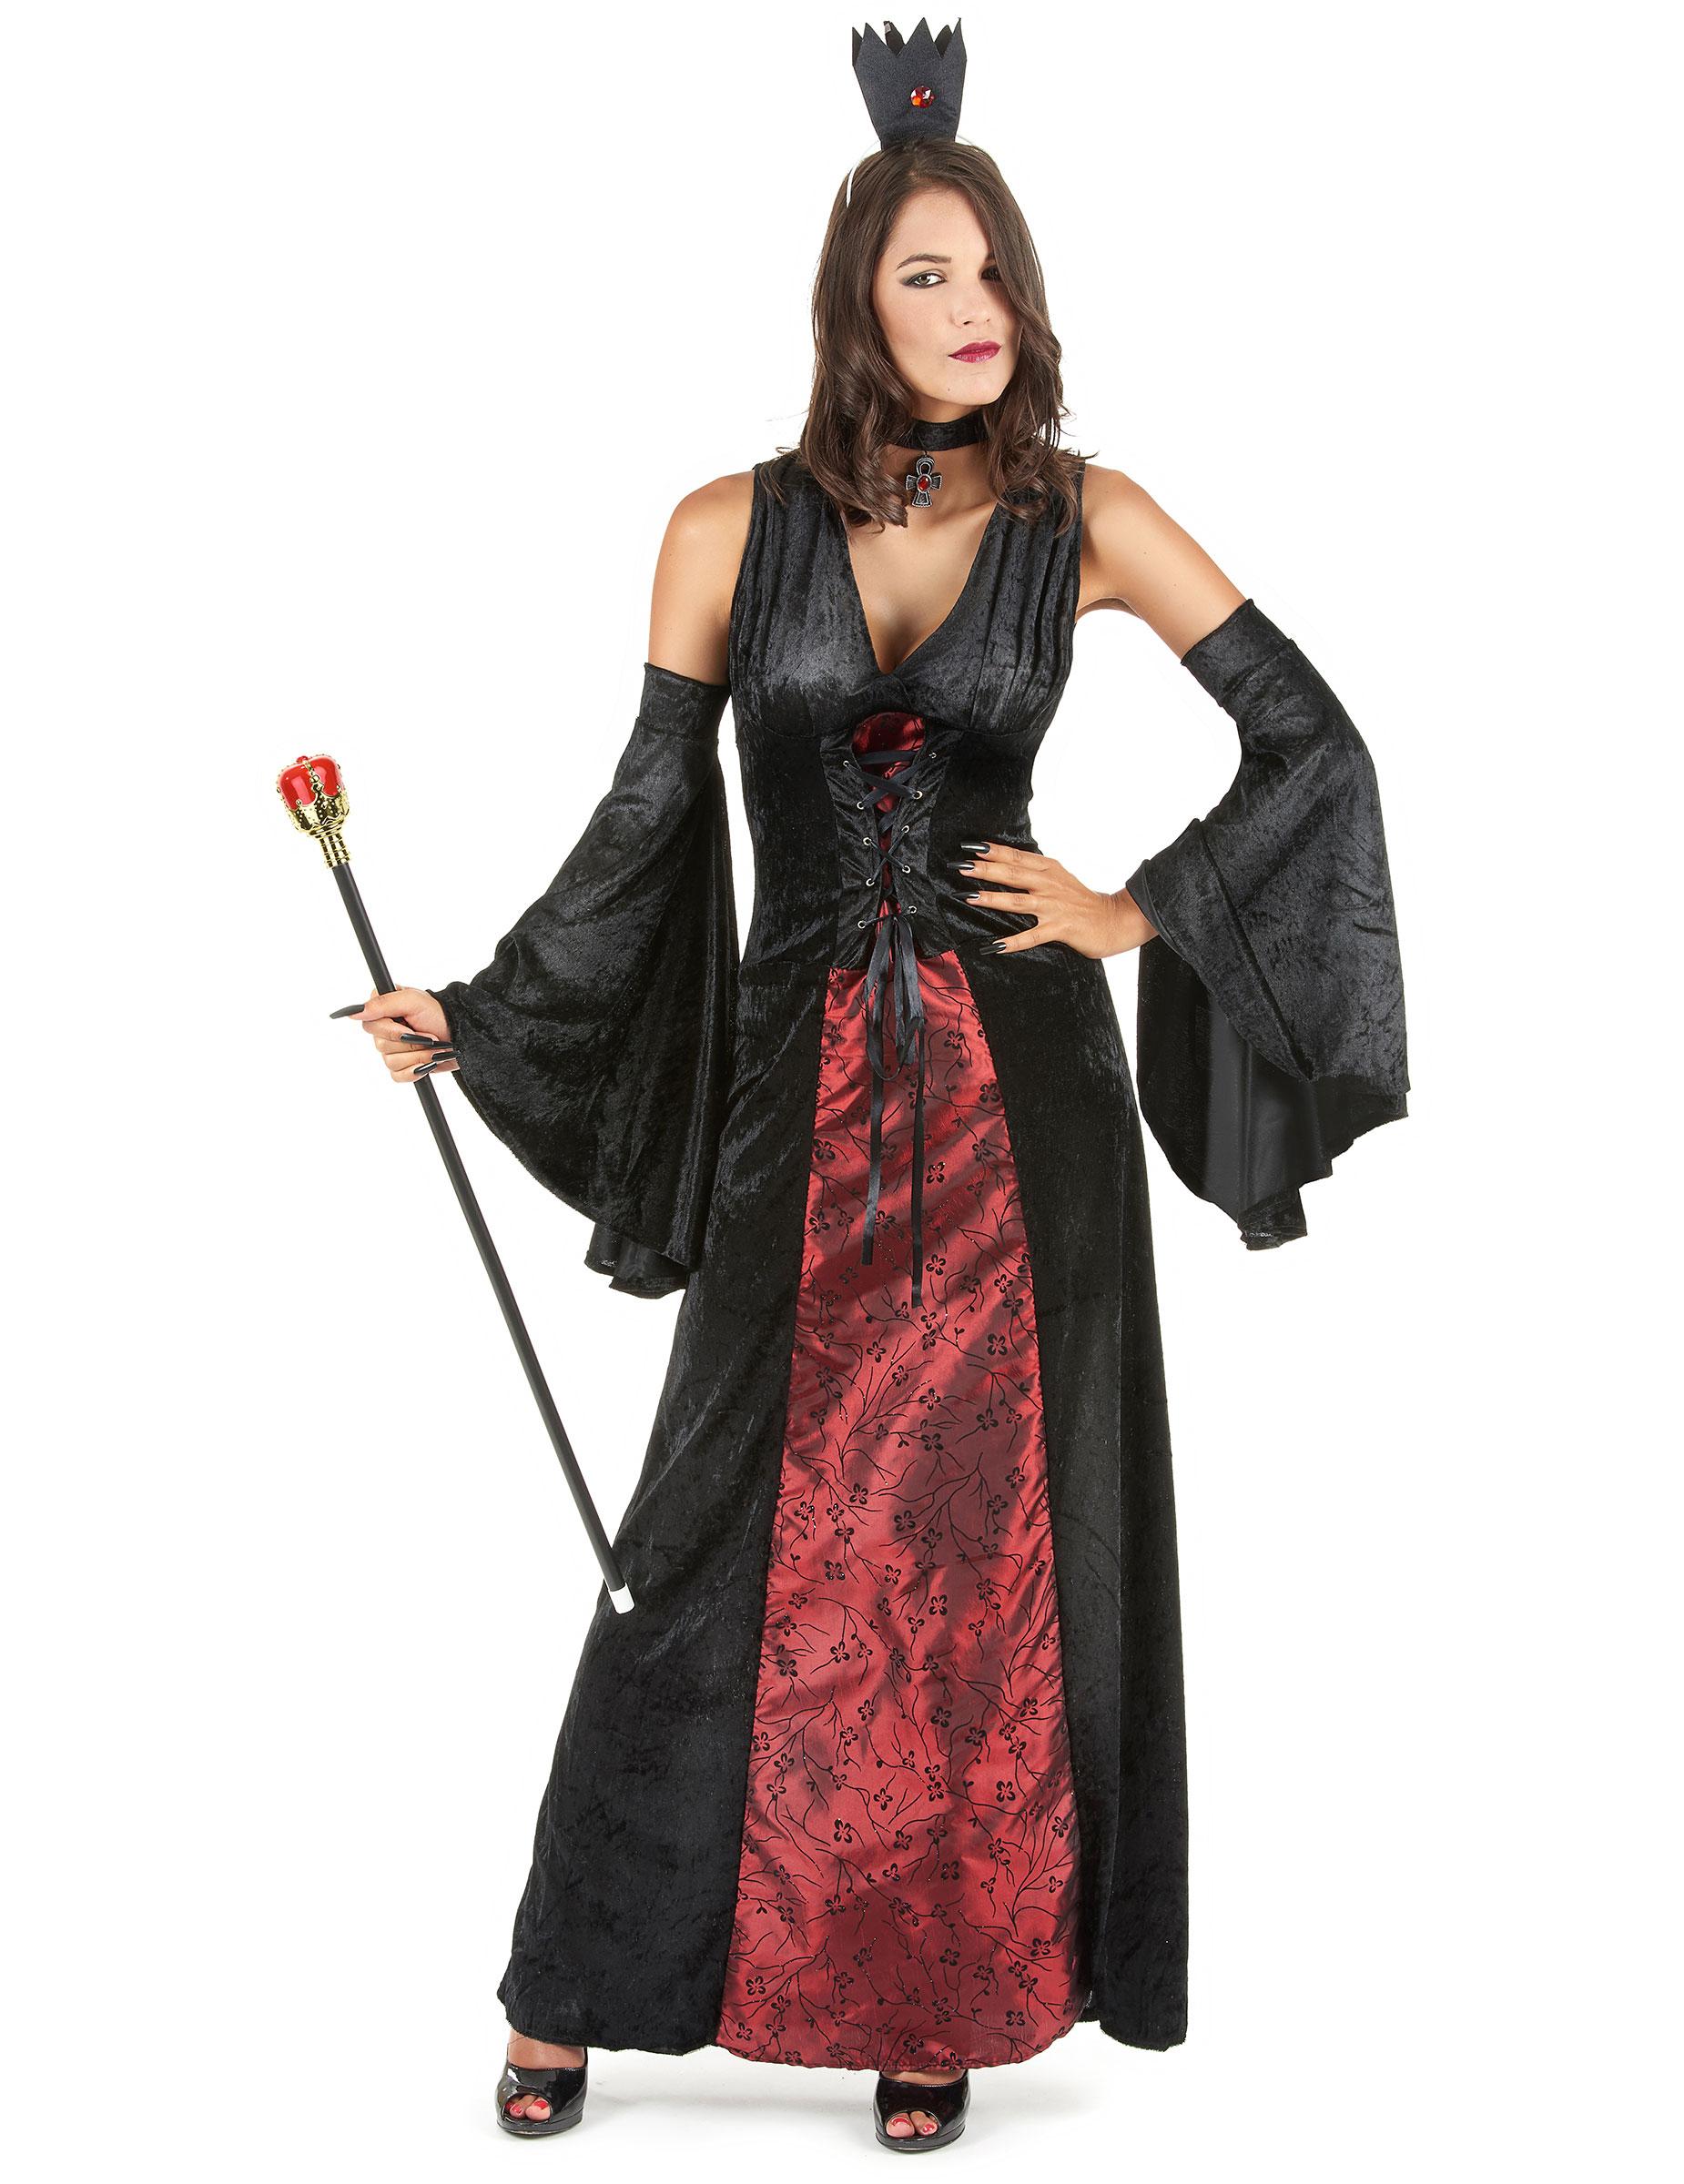 Vestito Halloween donna vampira 3faf336a84f8